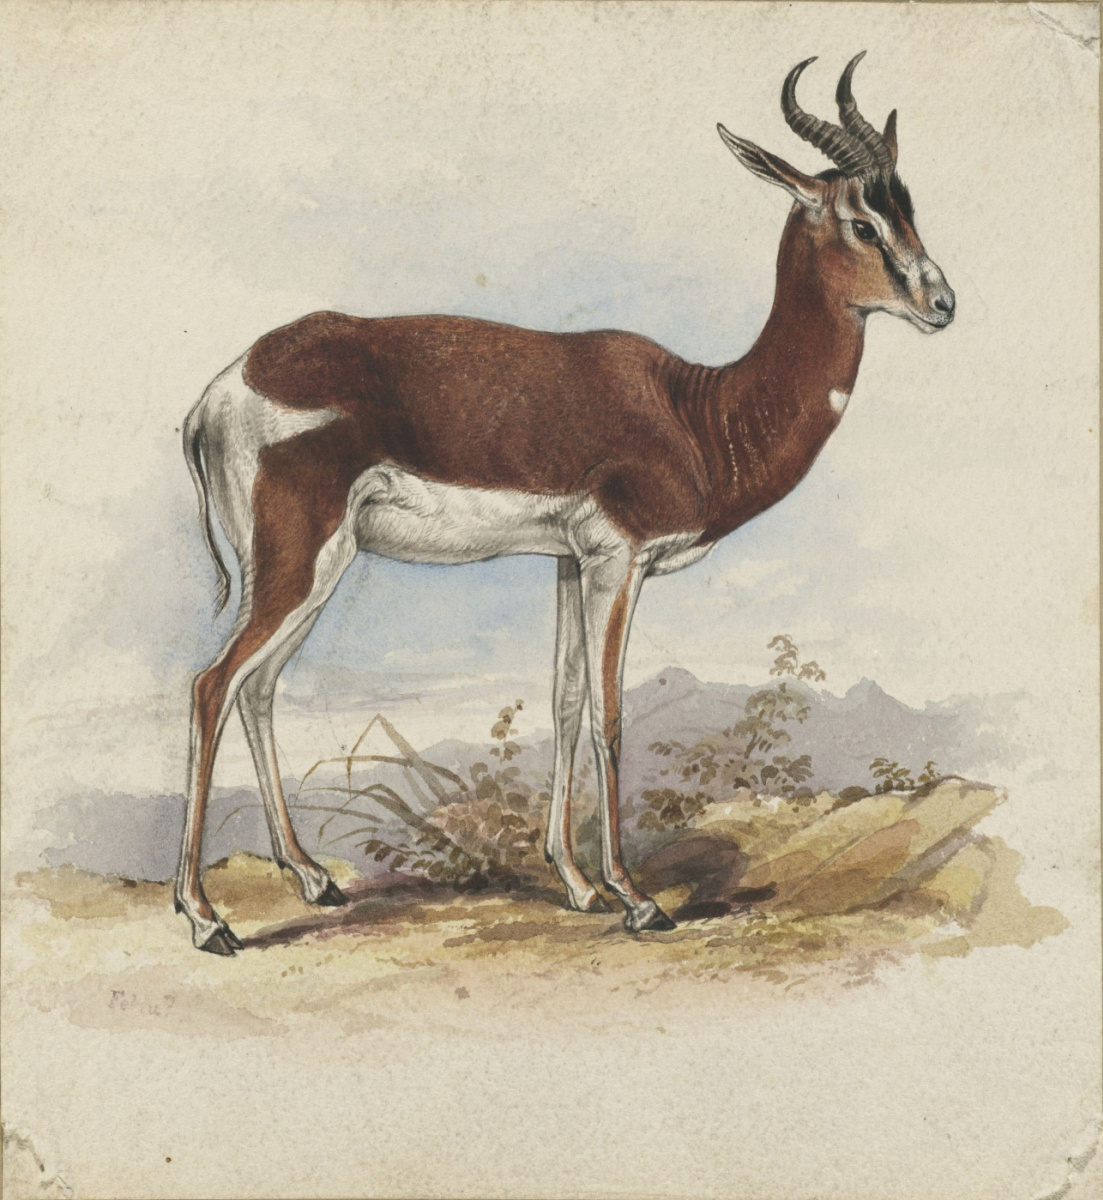 Эдвард Лир. Antelope